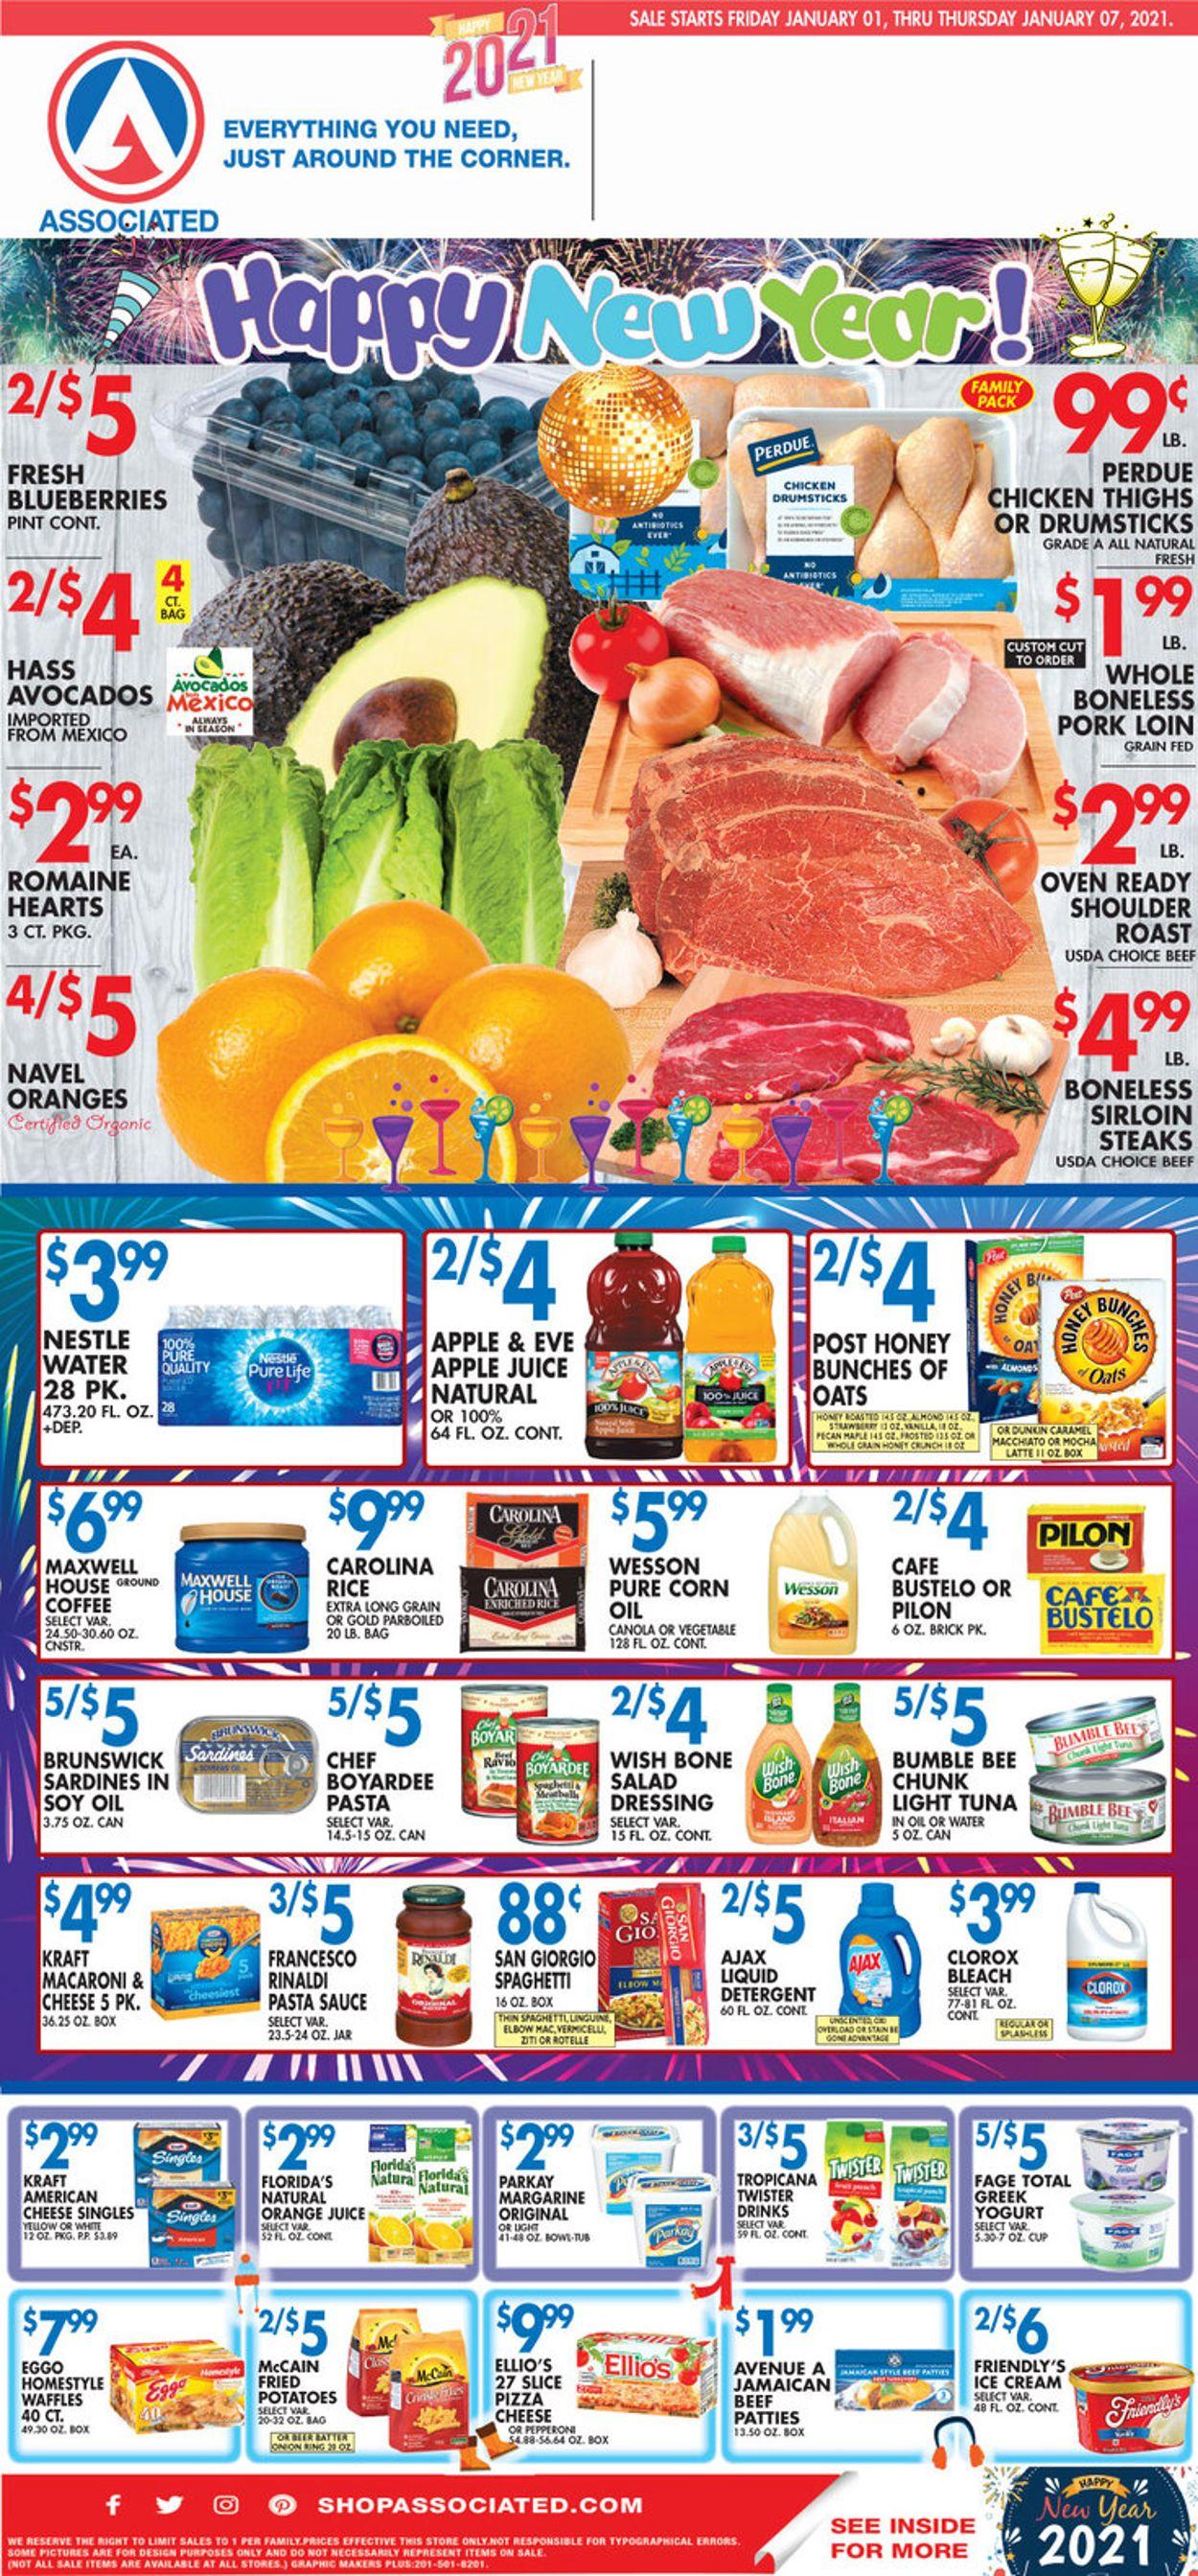 Associated Supermarkets Weekly Ad Circular - valid 01/01-01/07/2021